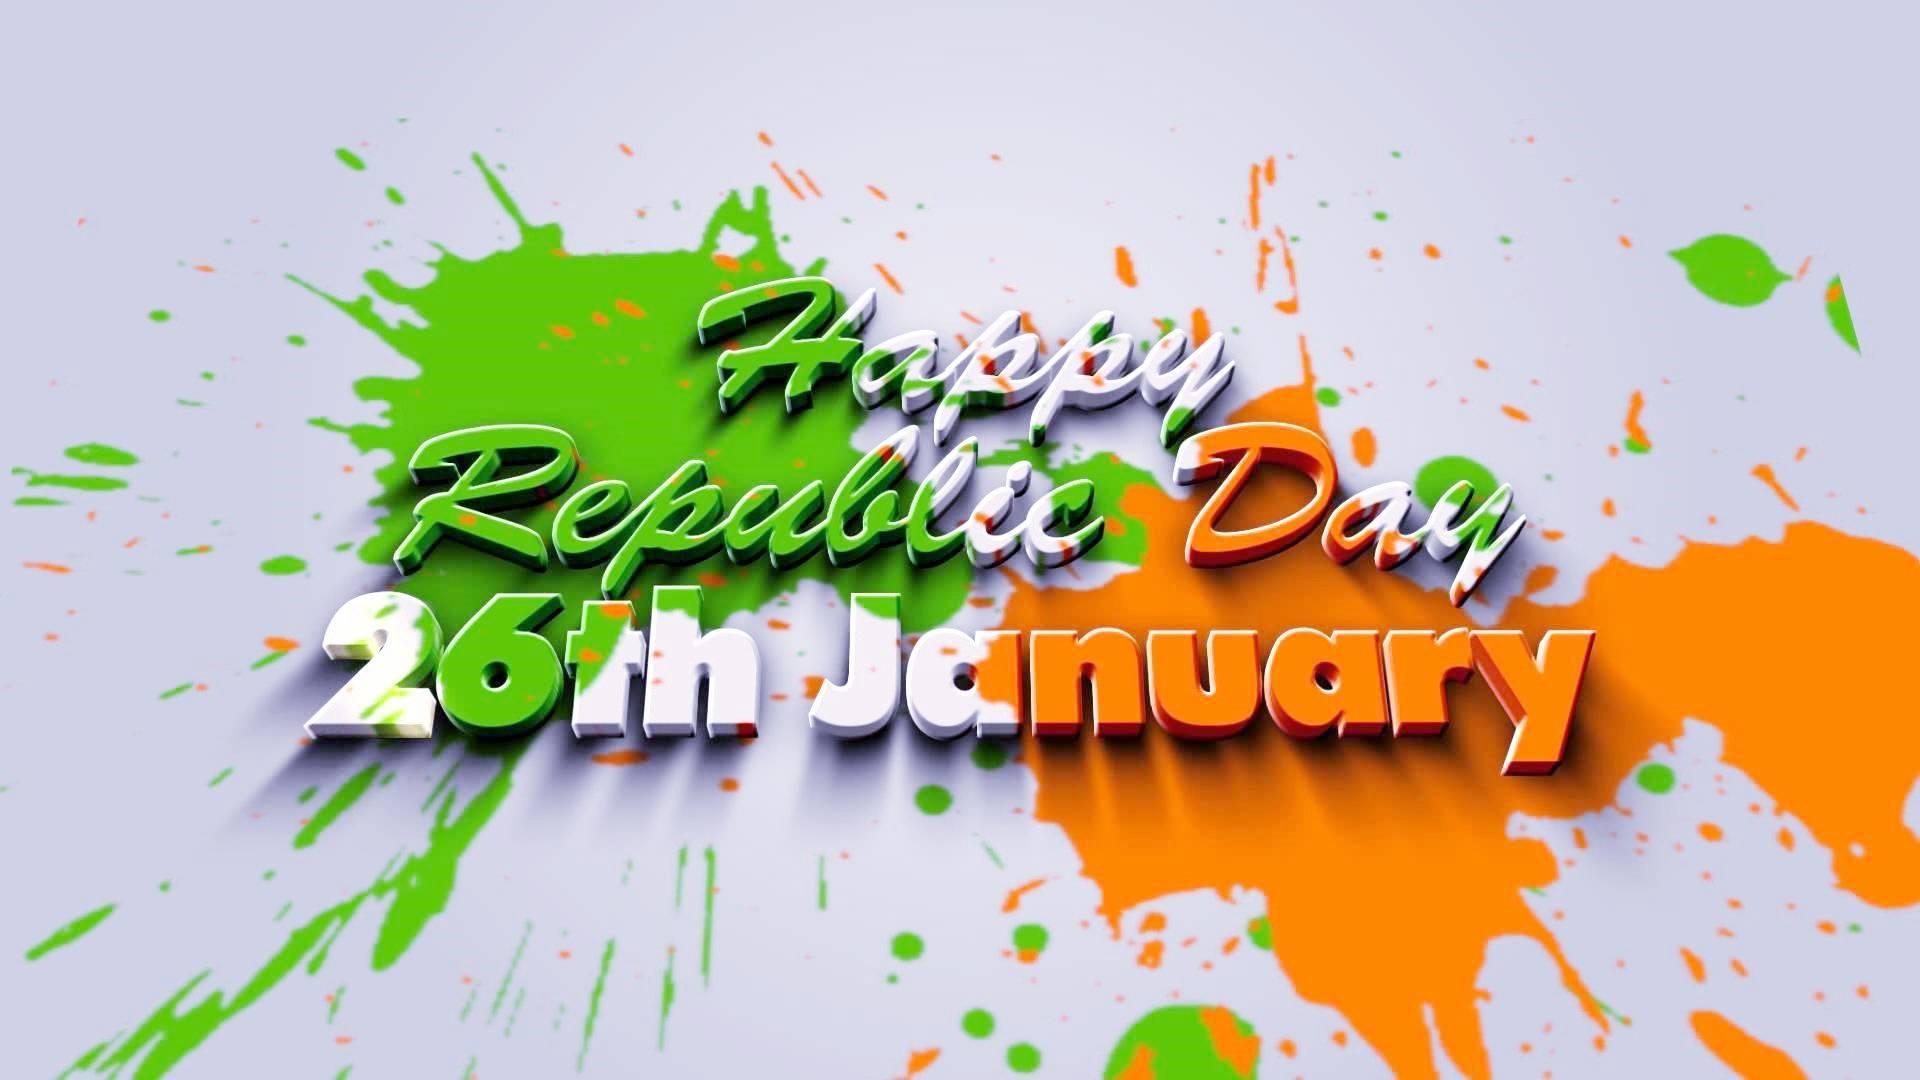 Happy-Republic-Day-2016